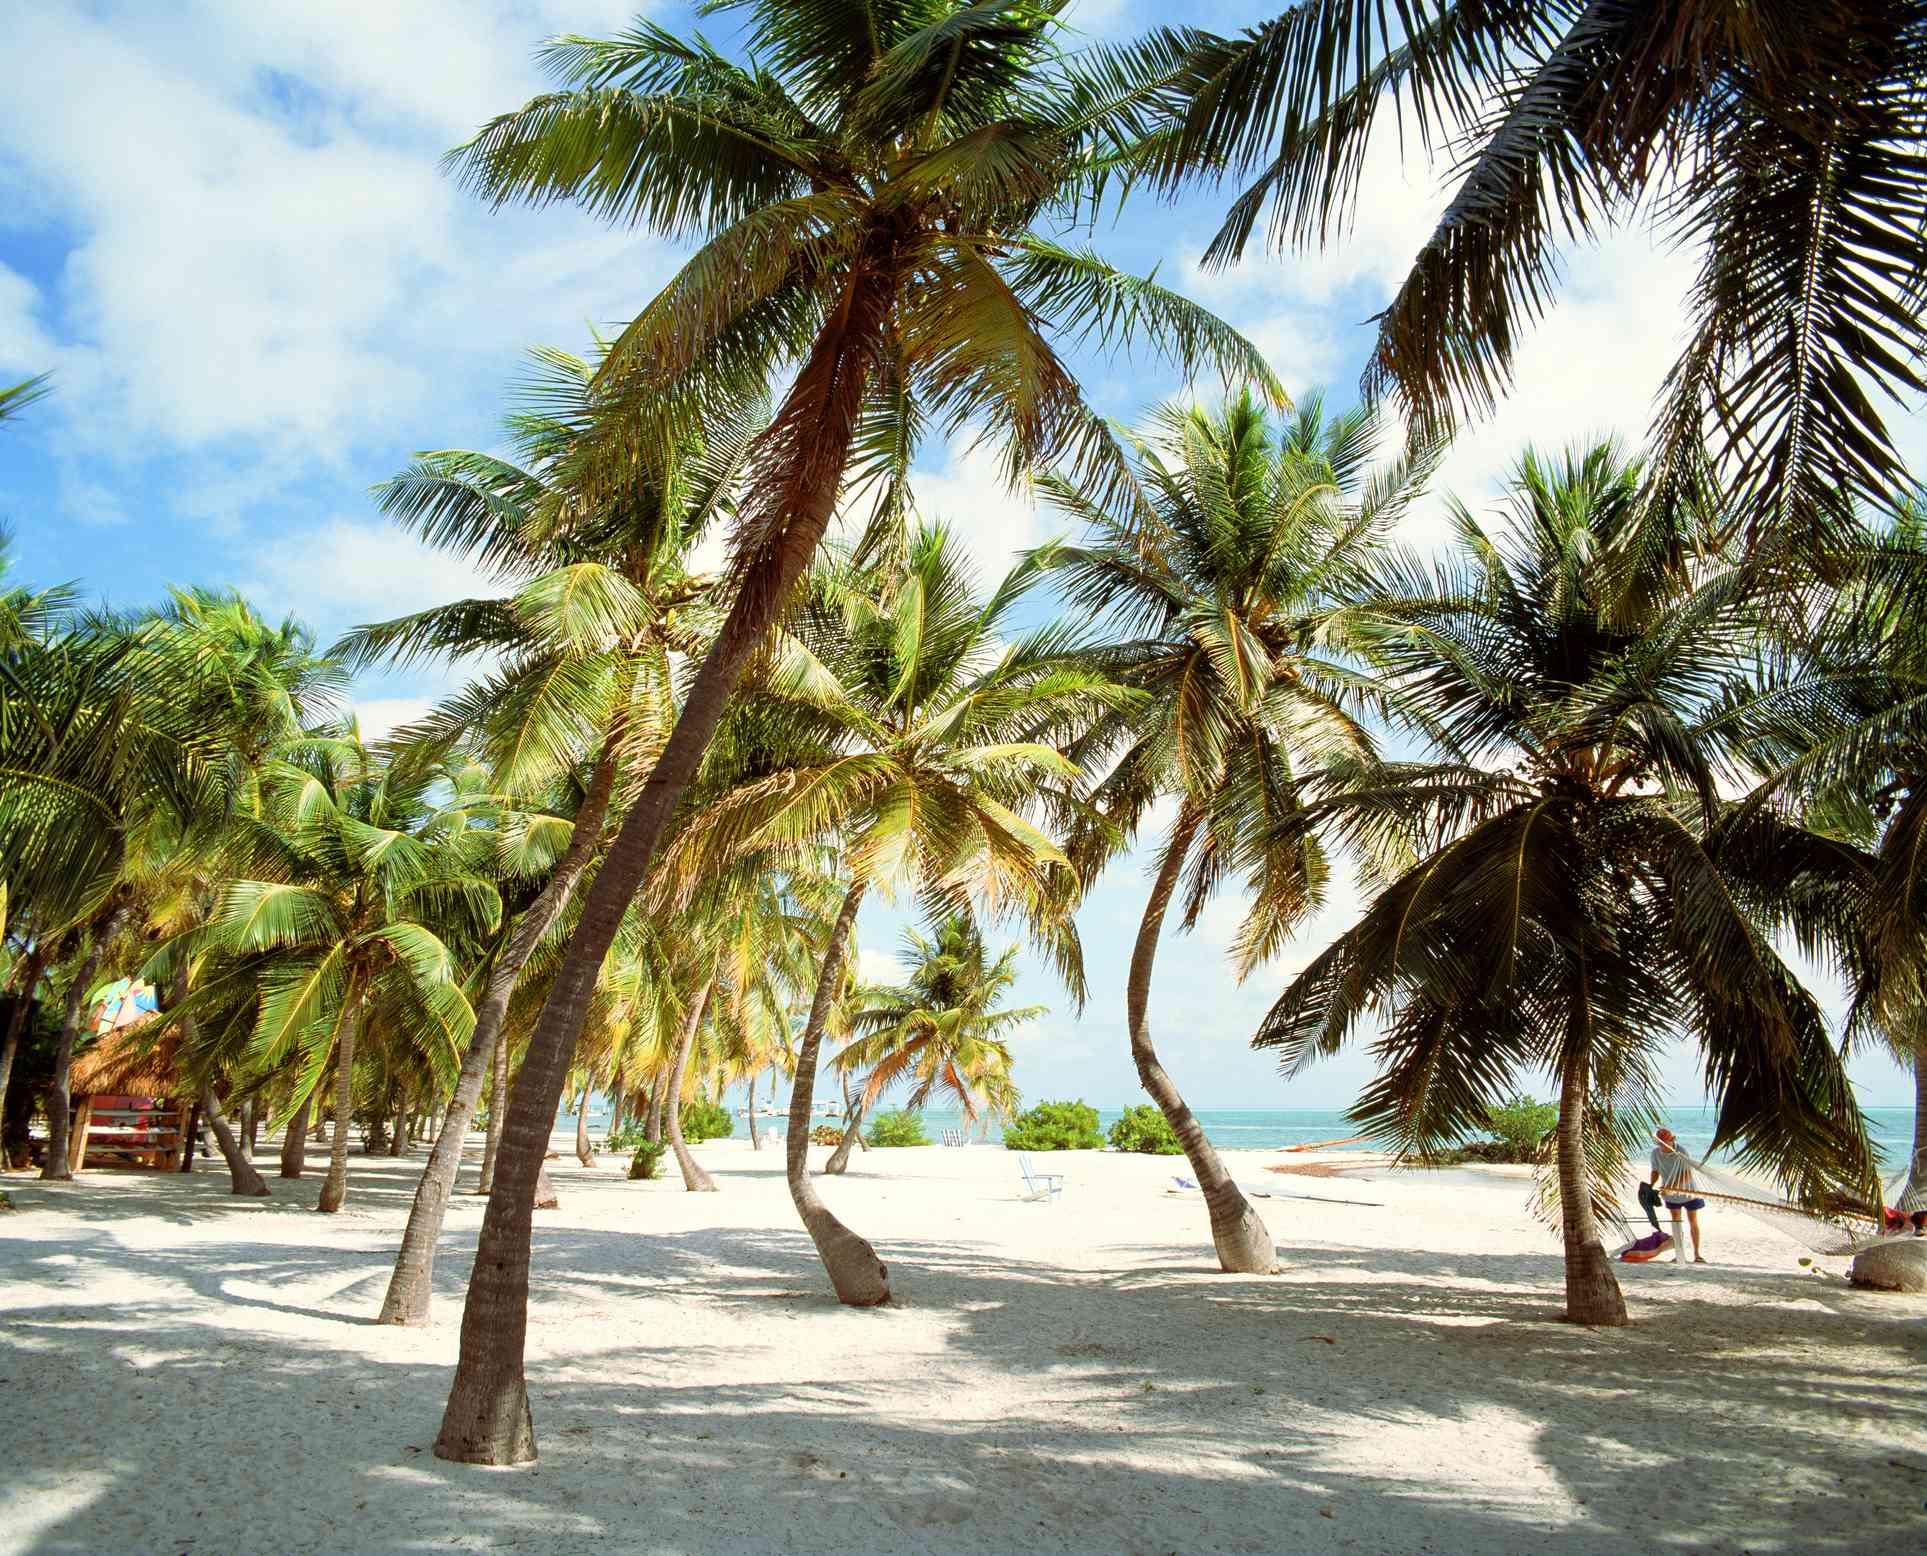 bent palm trees on a white sand beach